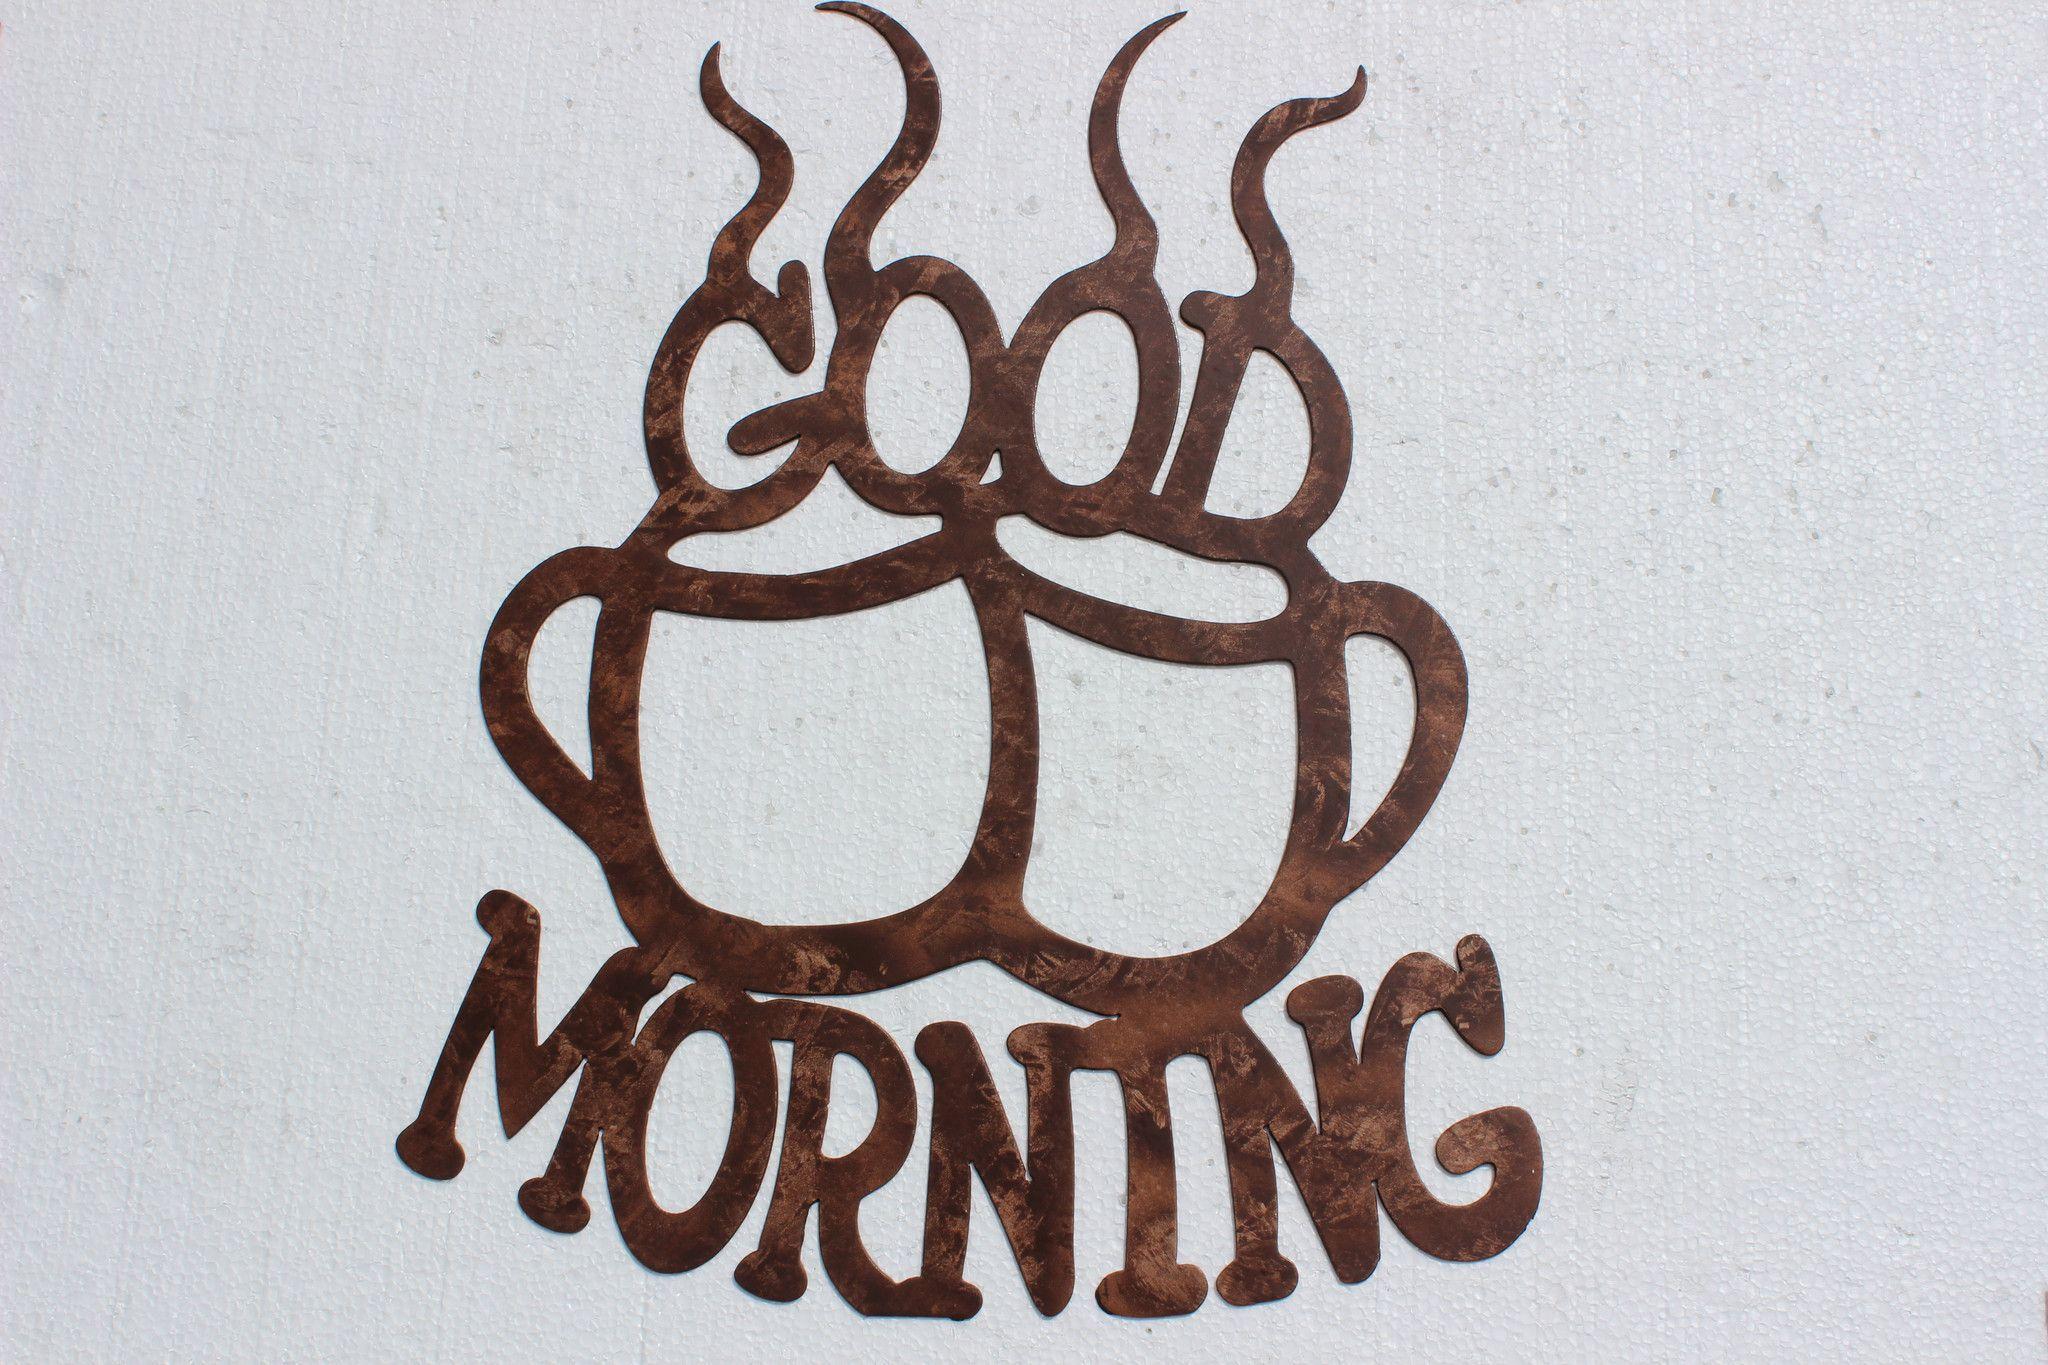 Good morning coffee cups kitchen decor metal wall art metal wall